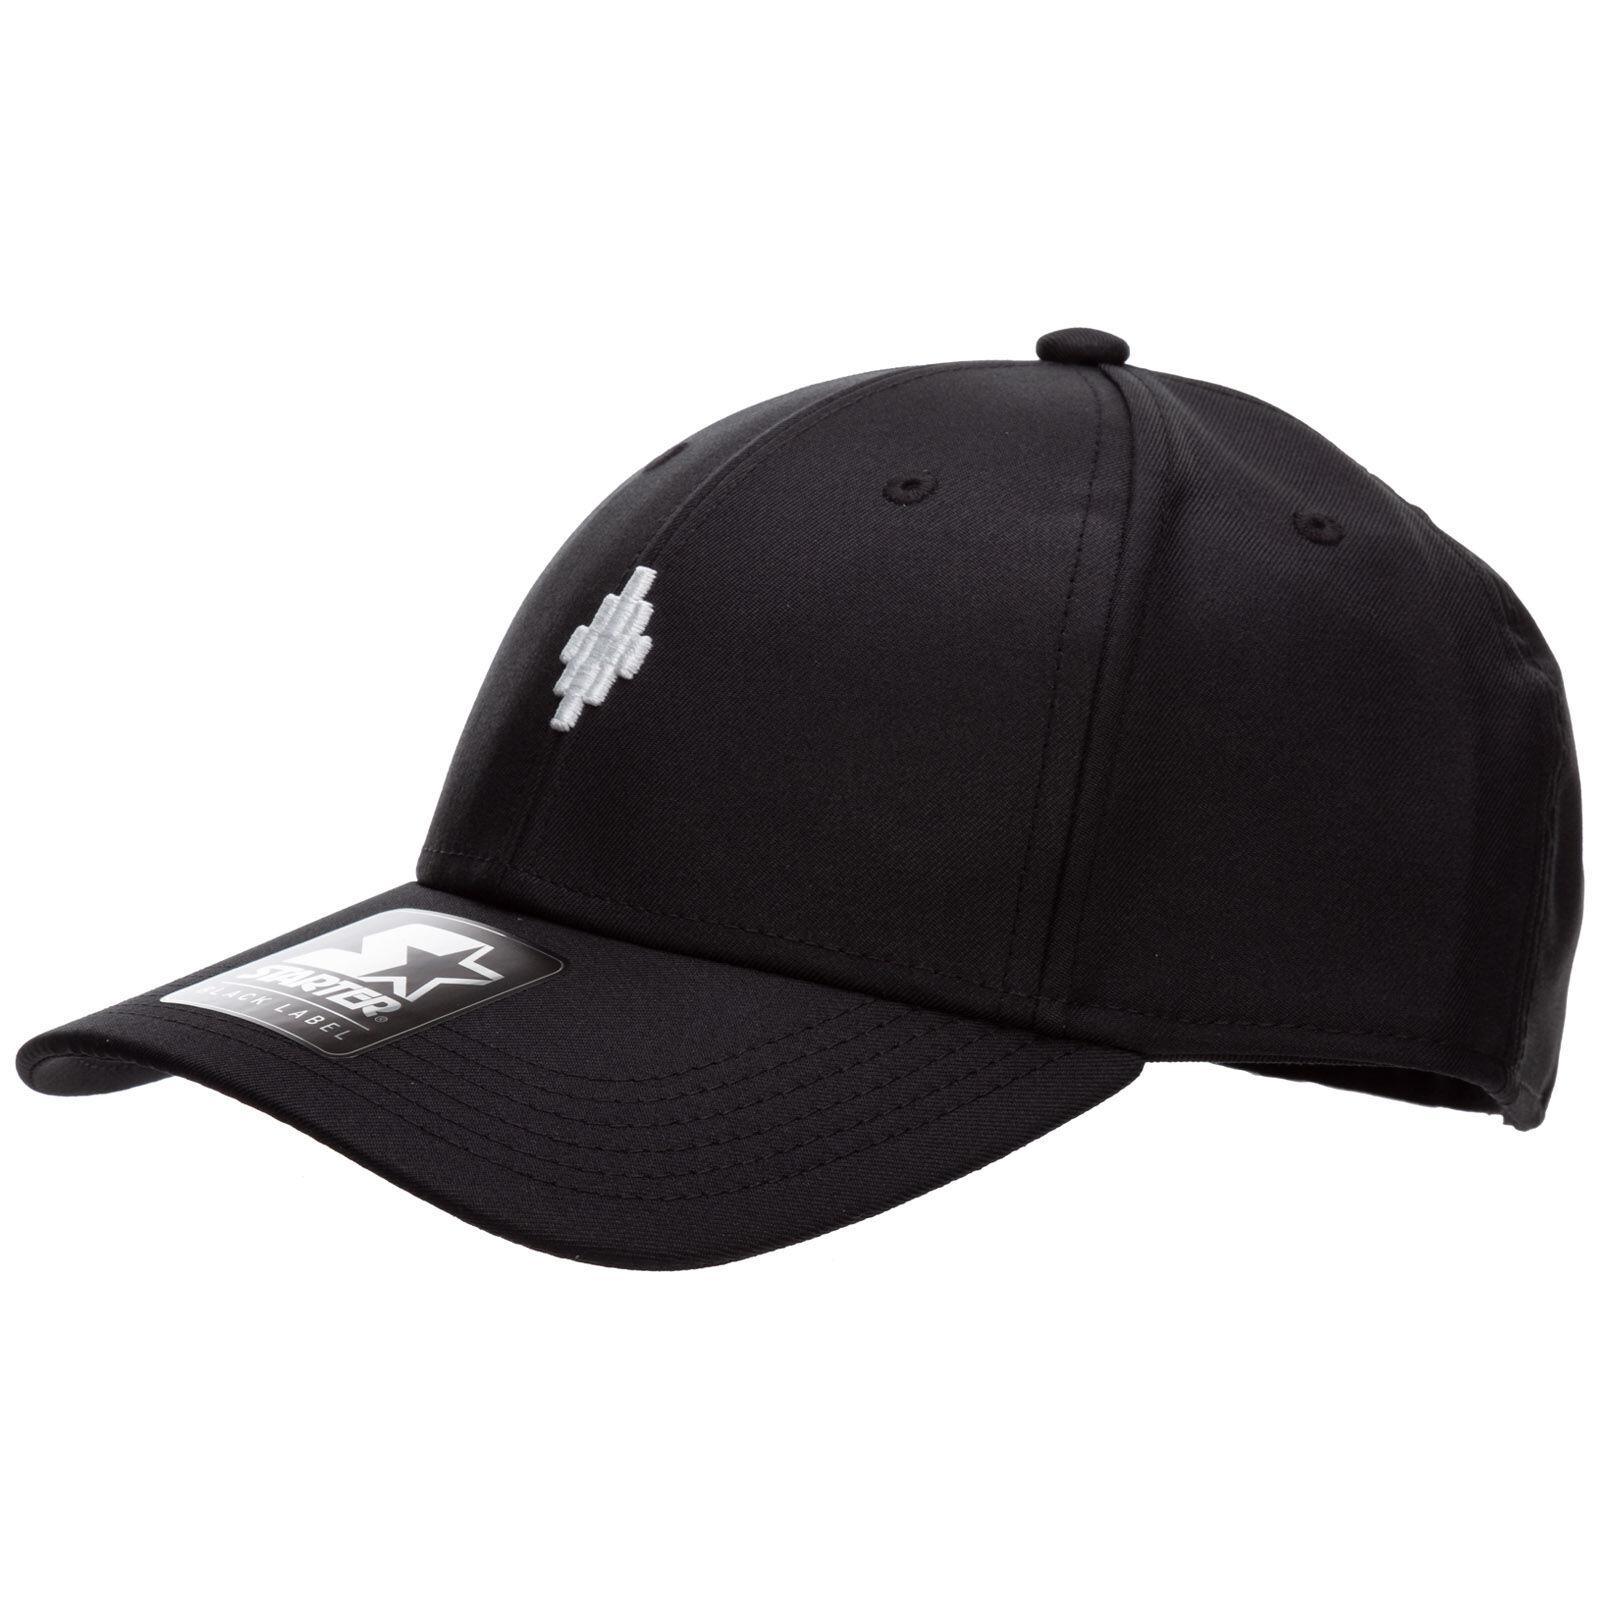 Marcelo Burlon Adjustable men's hat baseball cap cross  - Black